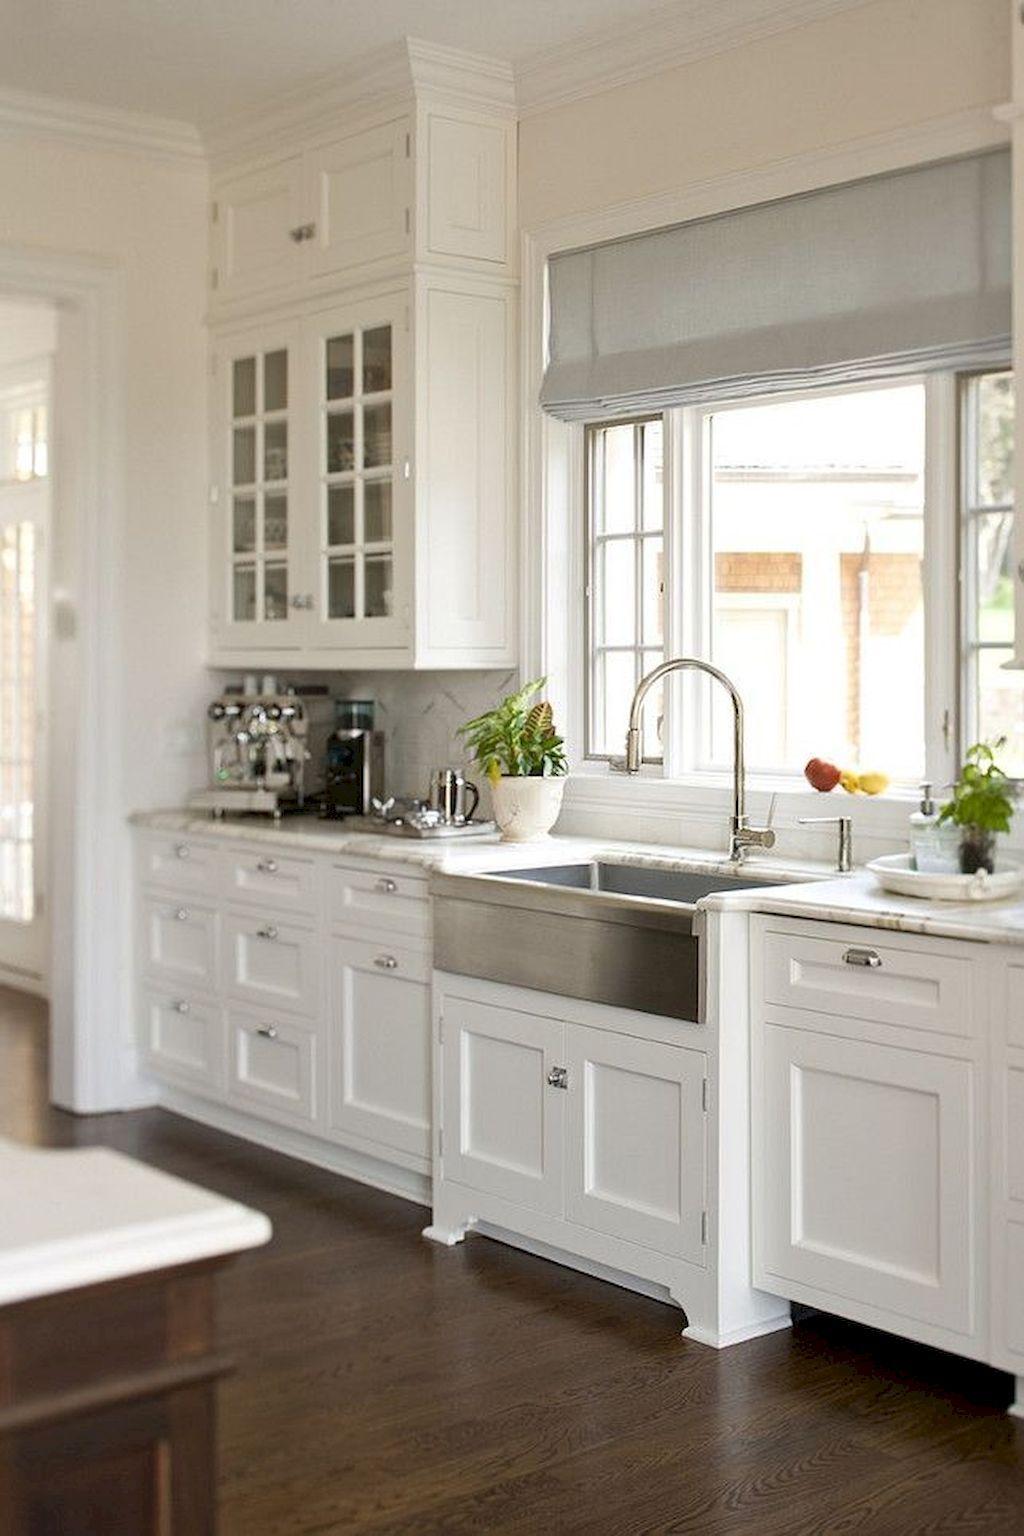 90 Pretty Farmhouse Kitchen Cabinet Design Ideas | Farmhouse kitchen ...